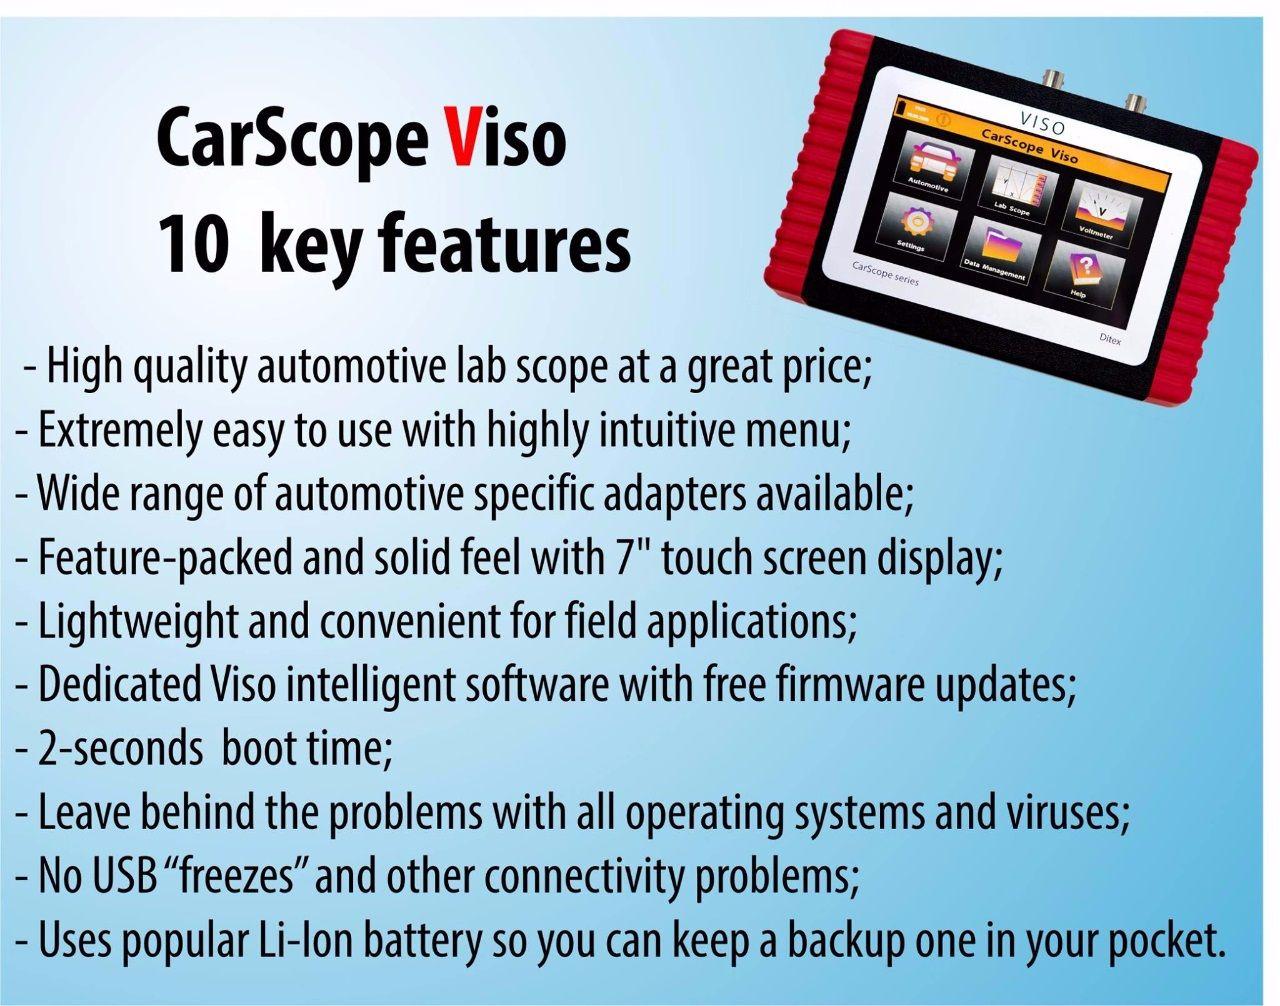 CarScope Viso makes life easy.